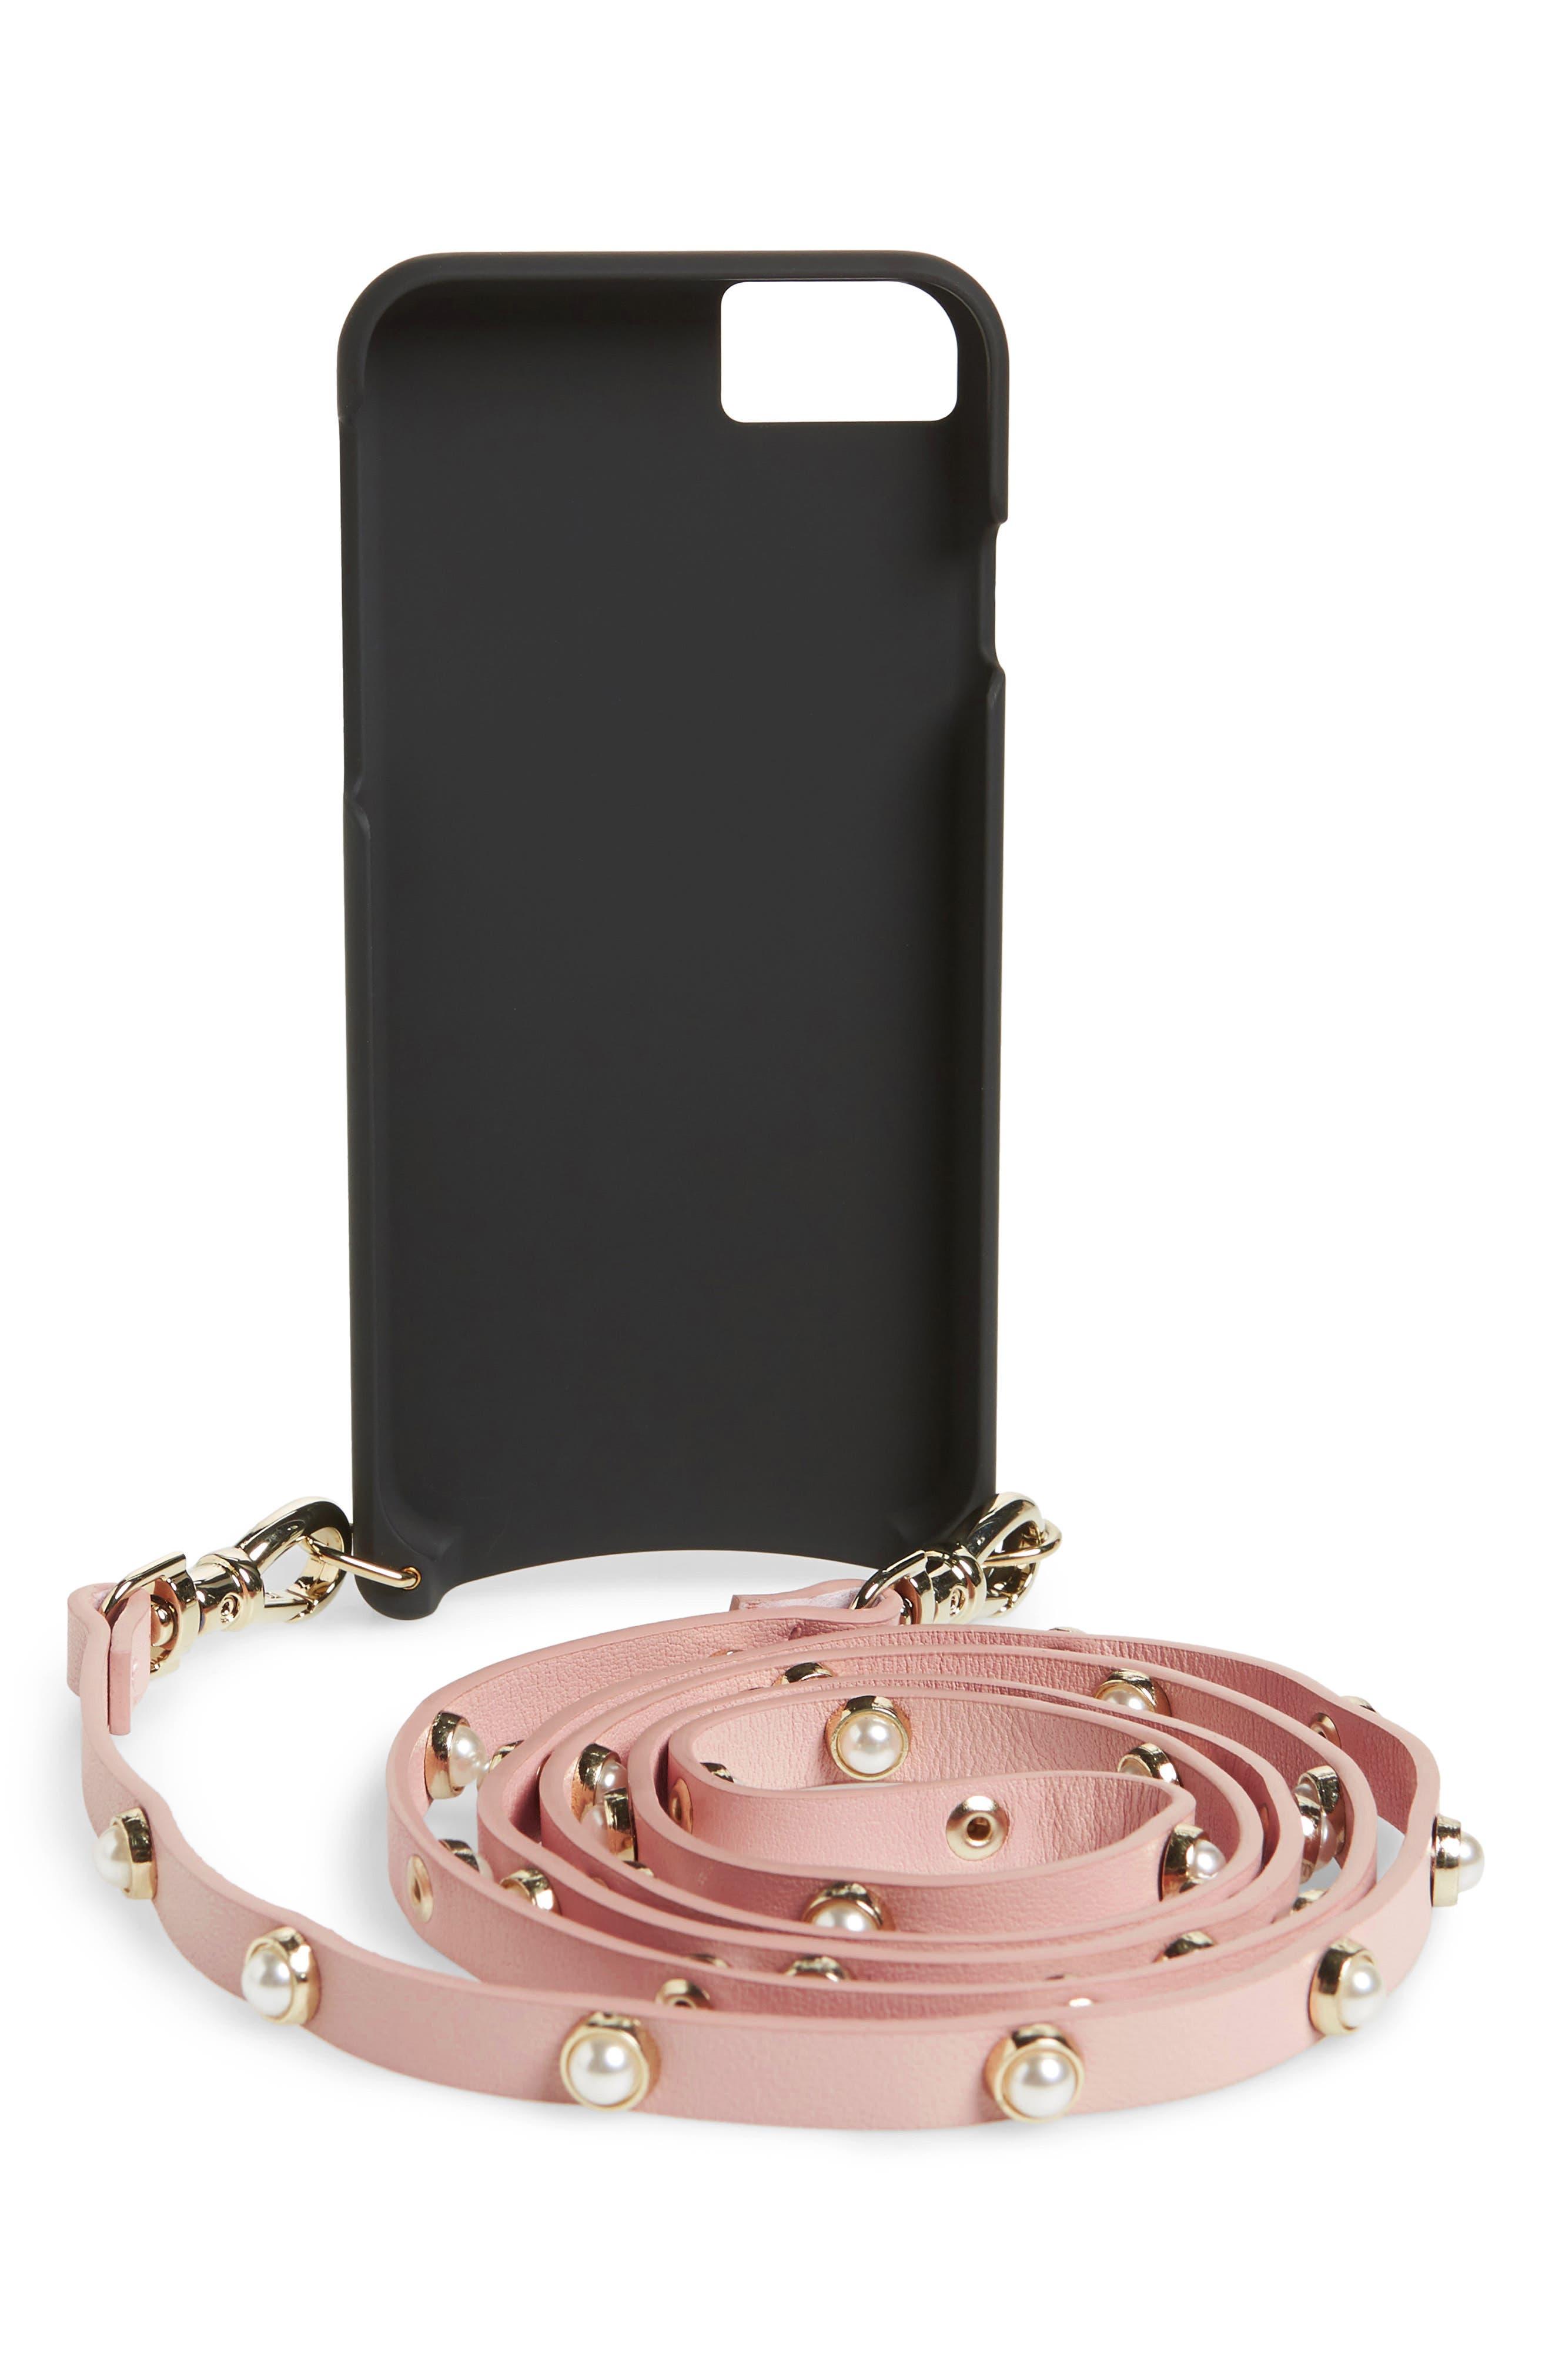 Claire Leather iPhone 7/8 & 7/8 Plus Crossbody Case,                             Alternate thumbnail 6, color,